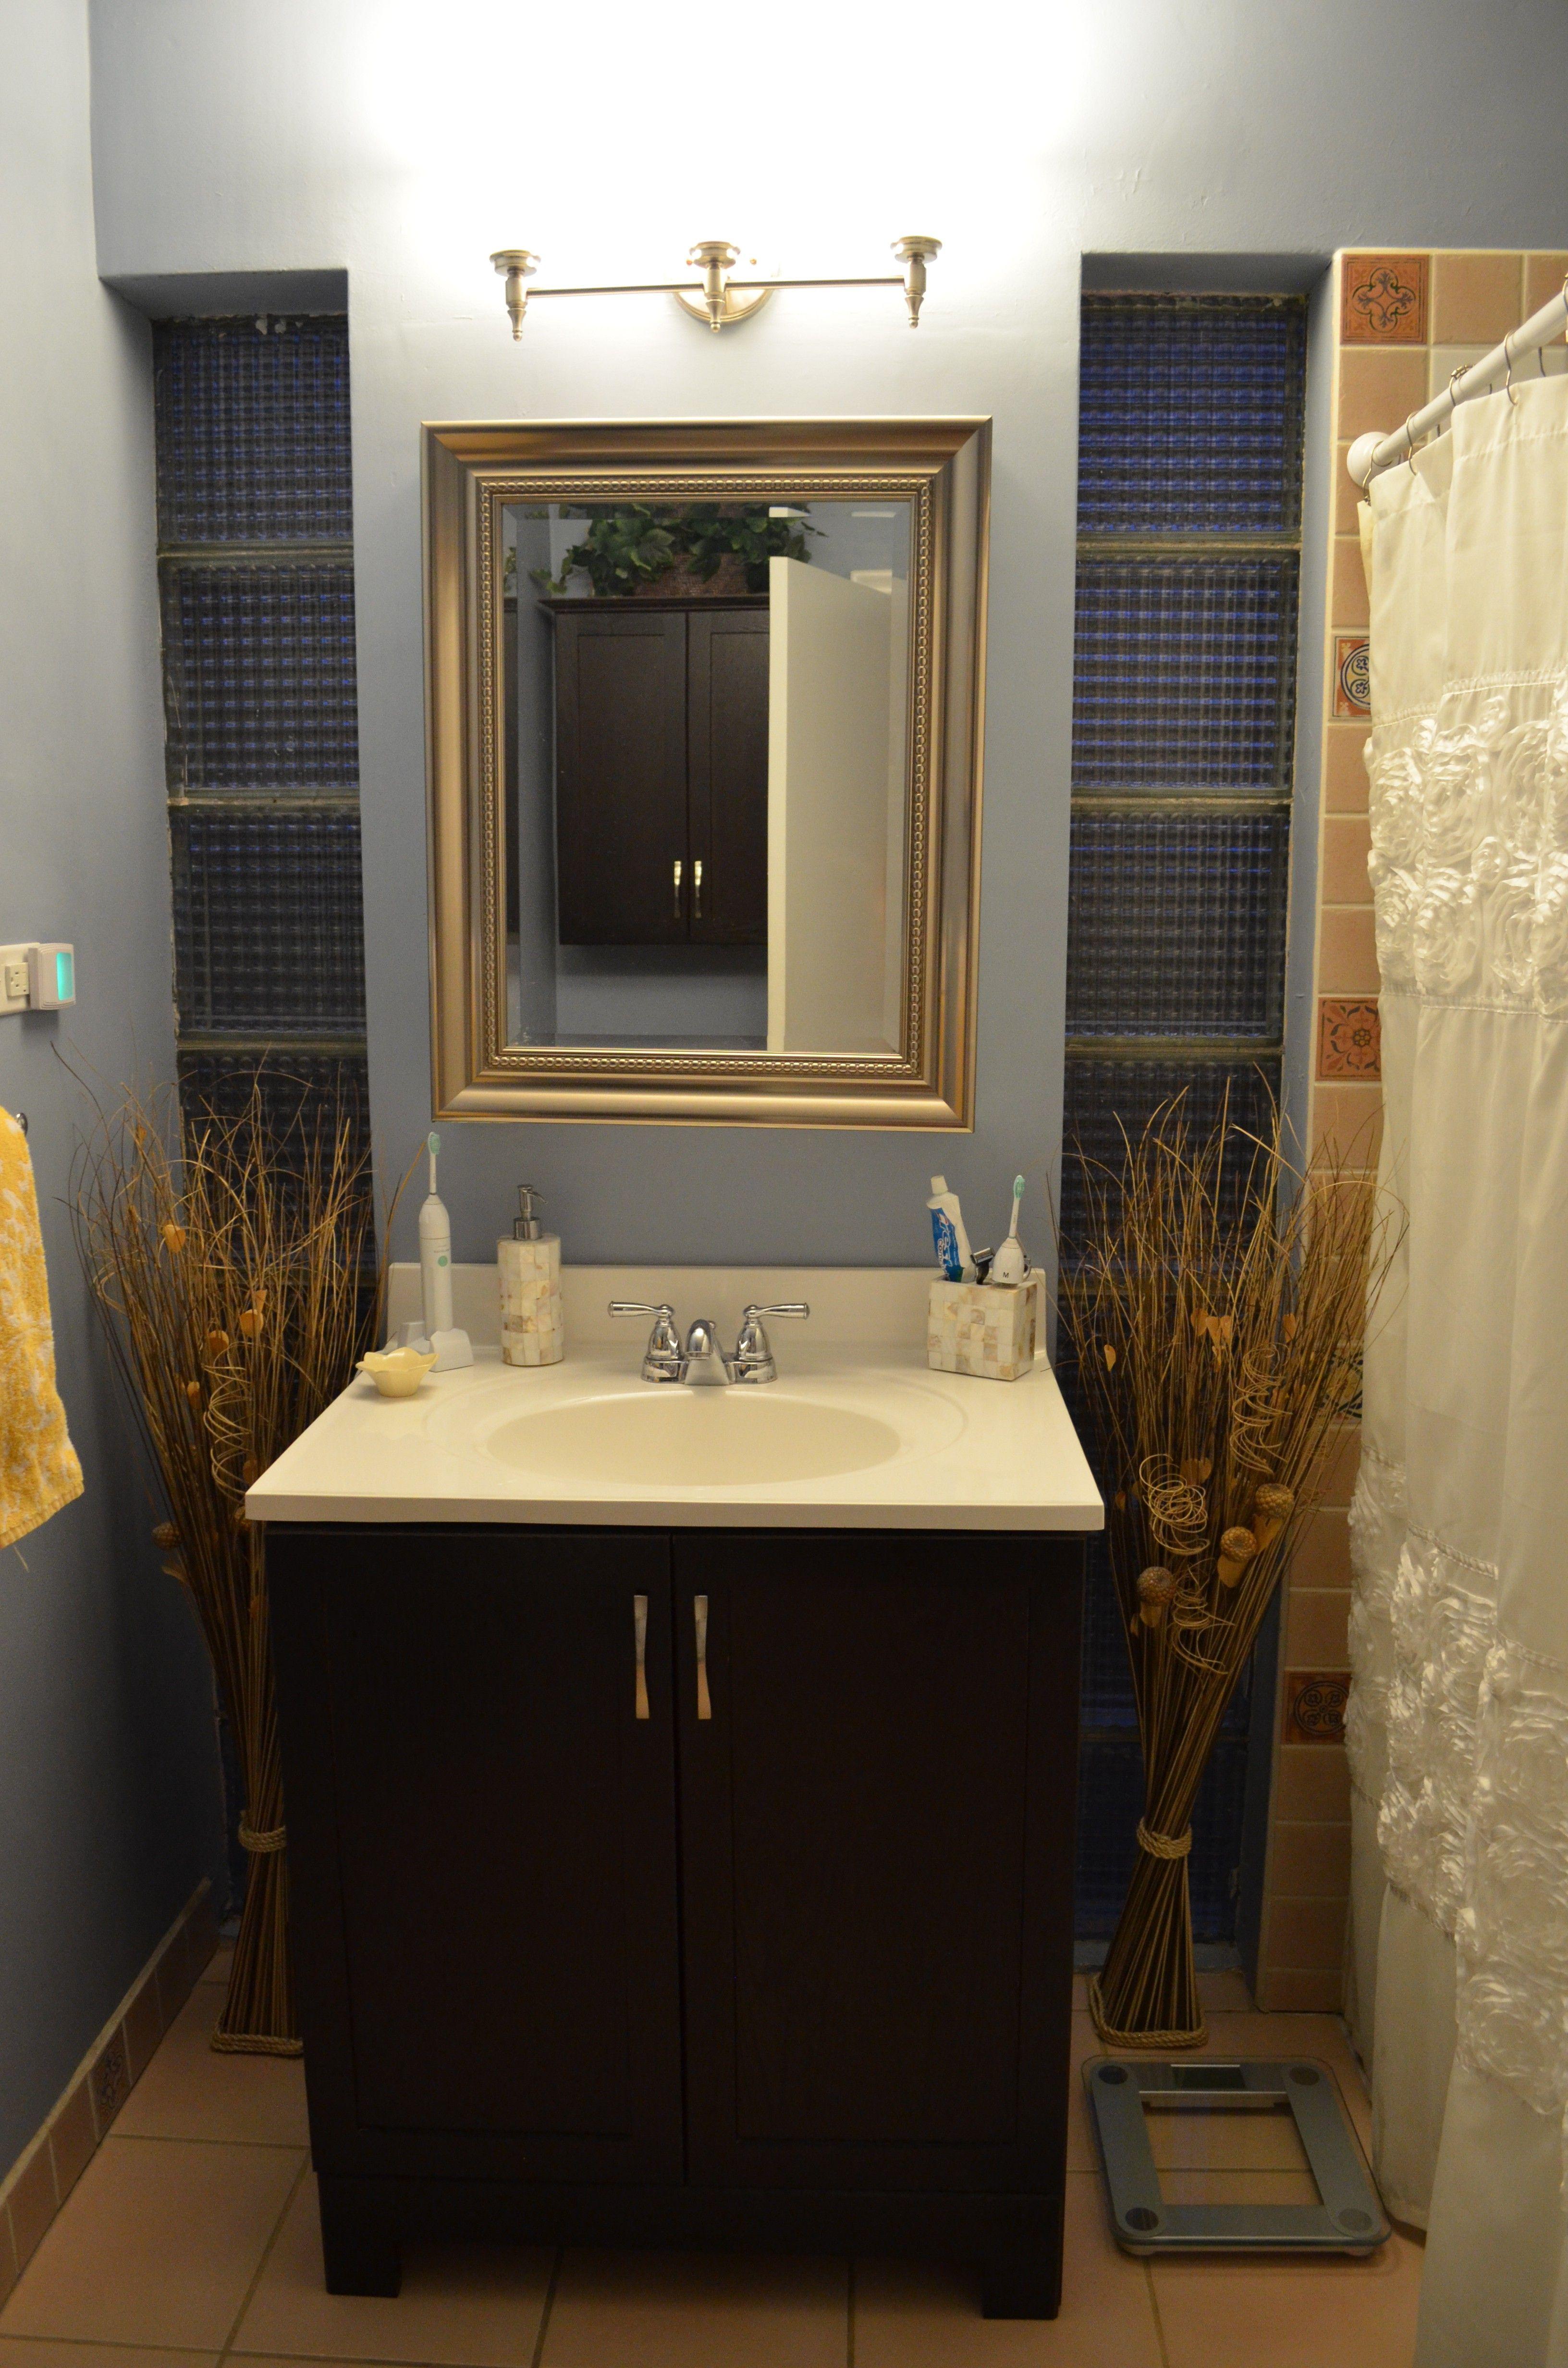 Bathroom Vanity Decor Ideas Bathroom Design - Medicine cabinets for small bathrooms for bathroom decor ideas